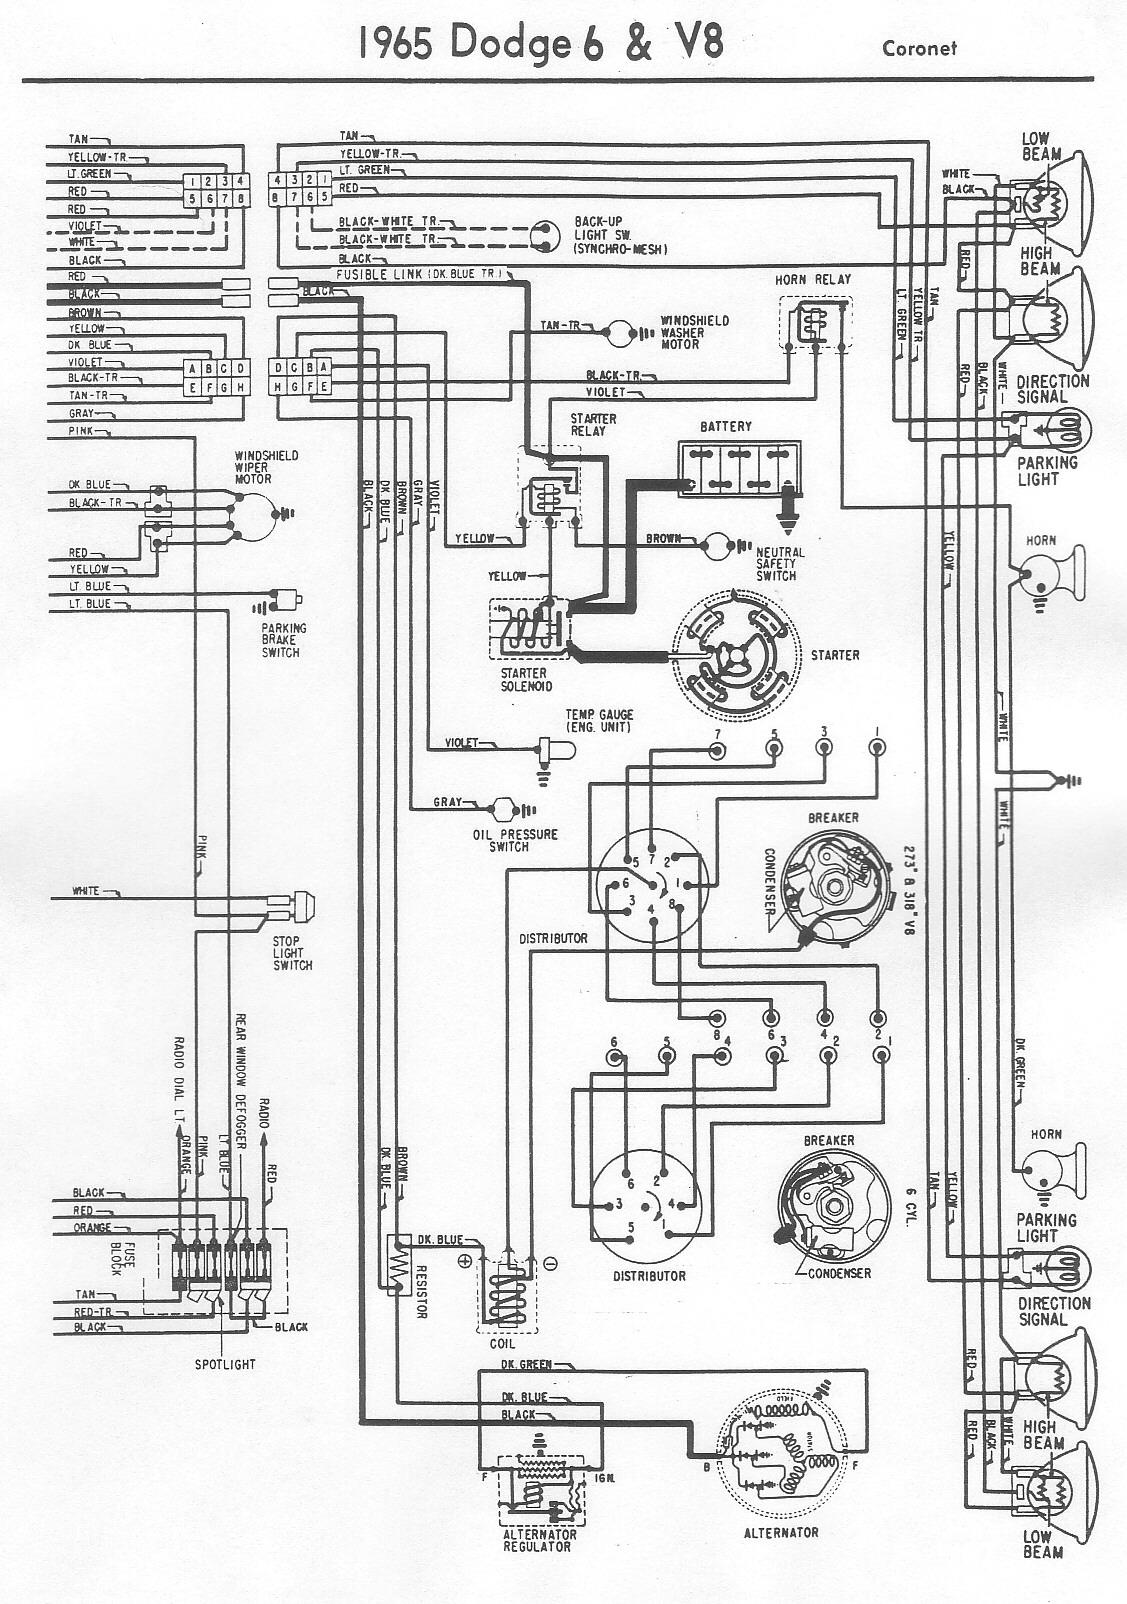 hight resolution of 1967 dodge alternator wiring wiring diagrams source67 dodge ignition wiring diagram automotive wiring diagrams dodge caravan